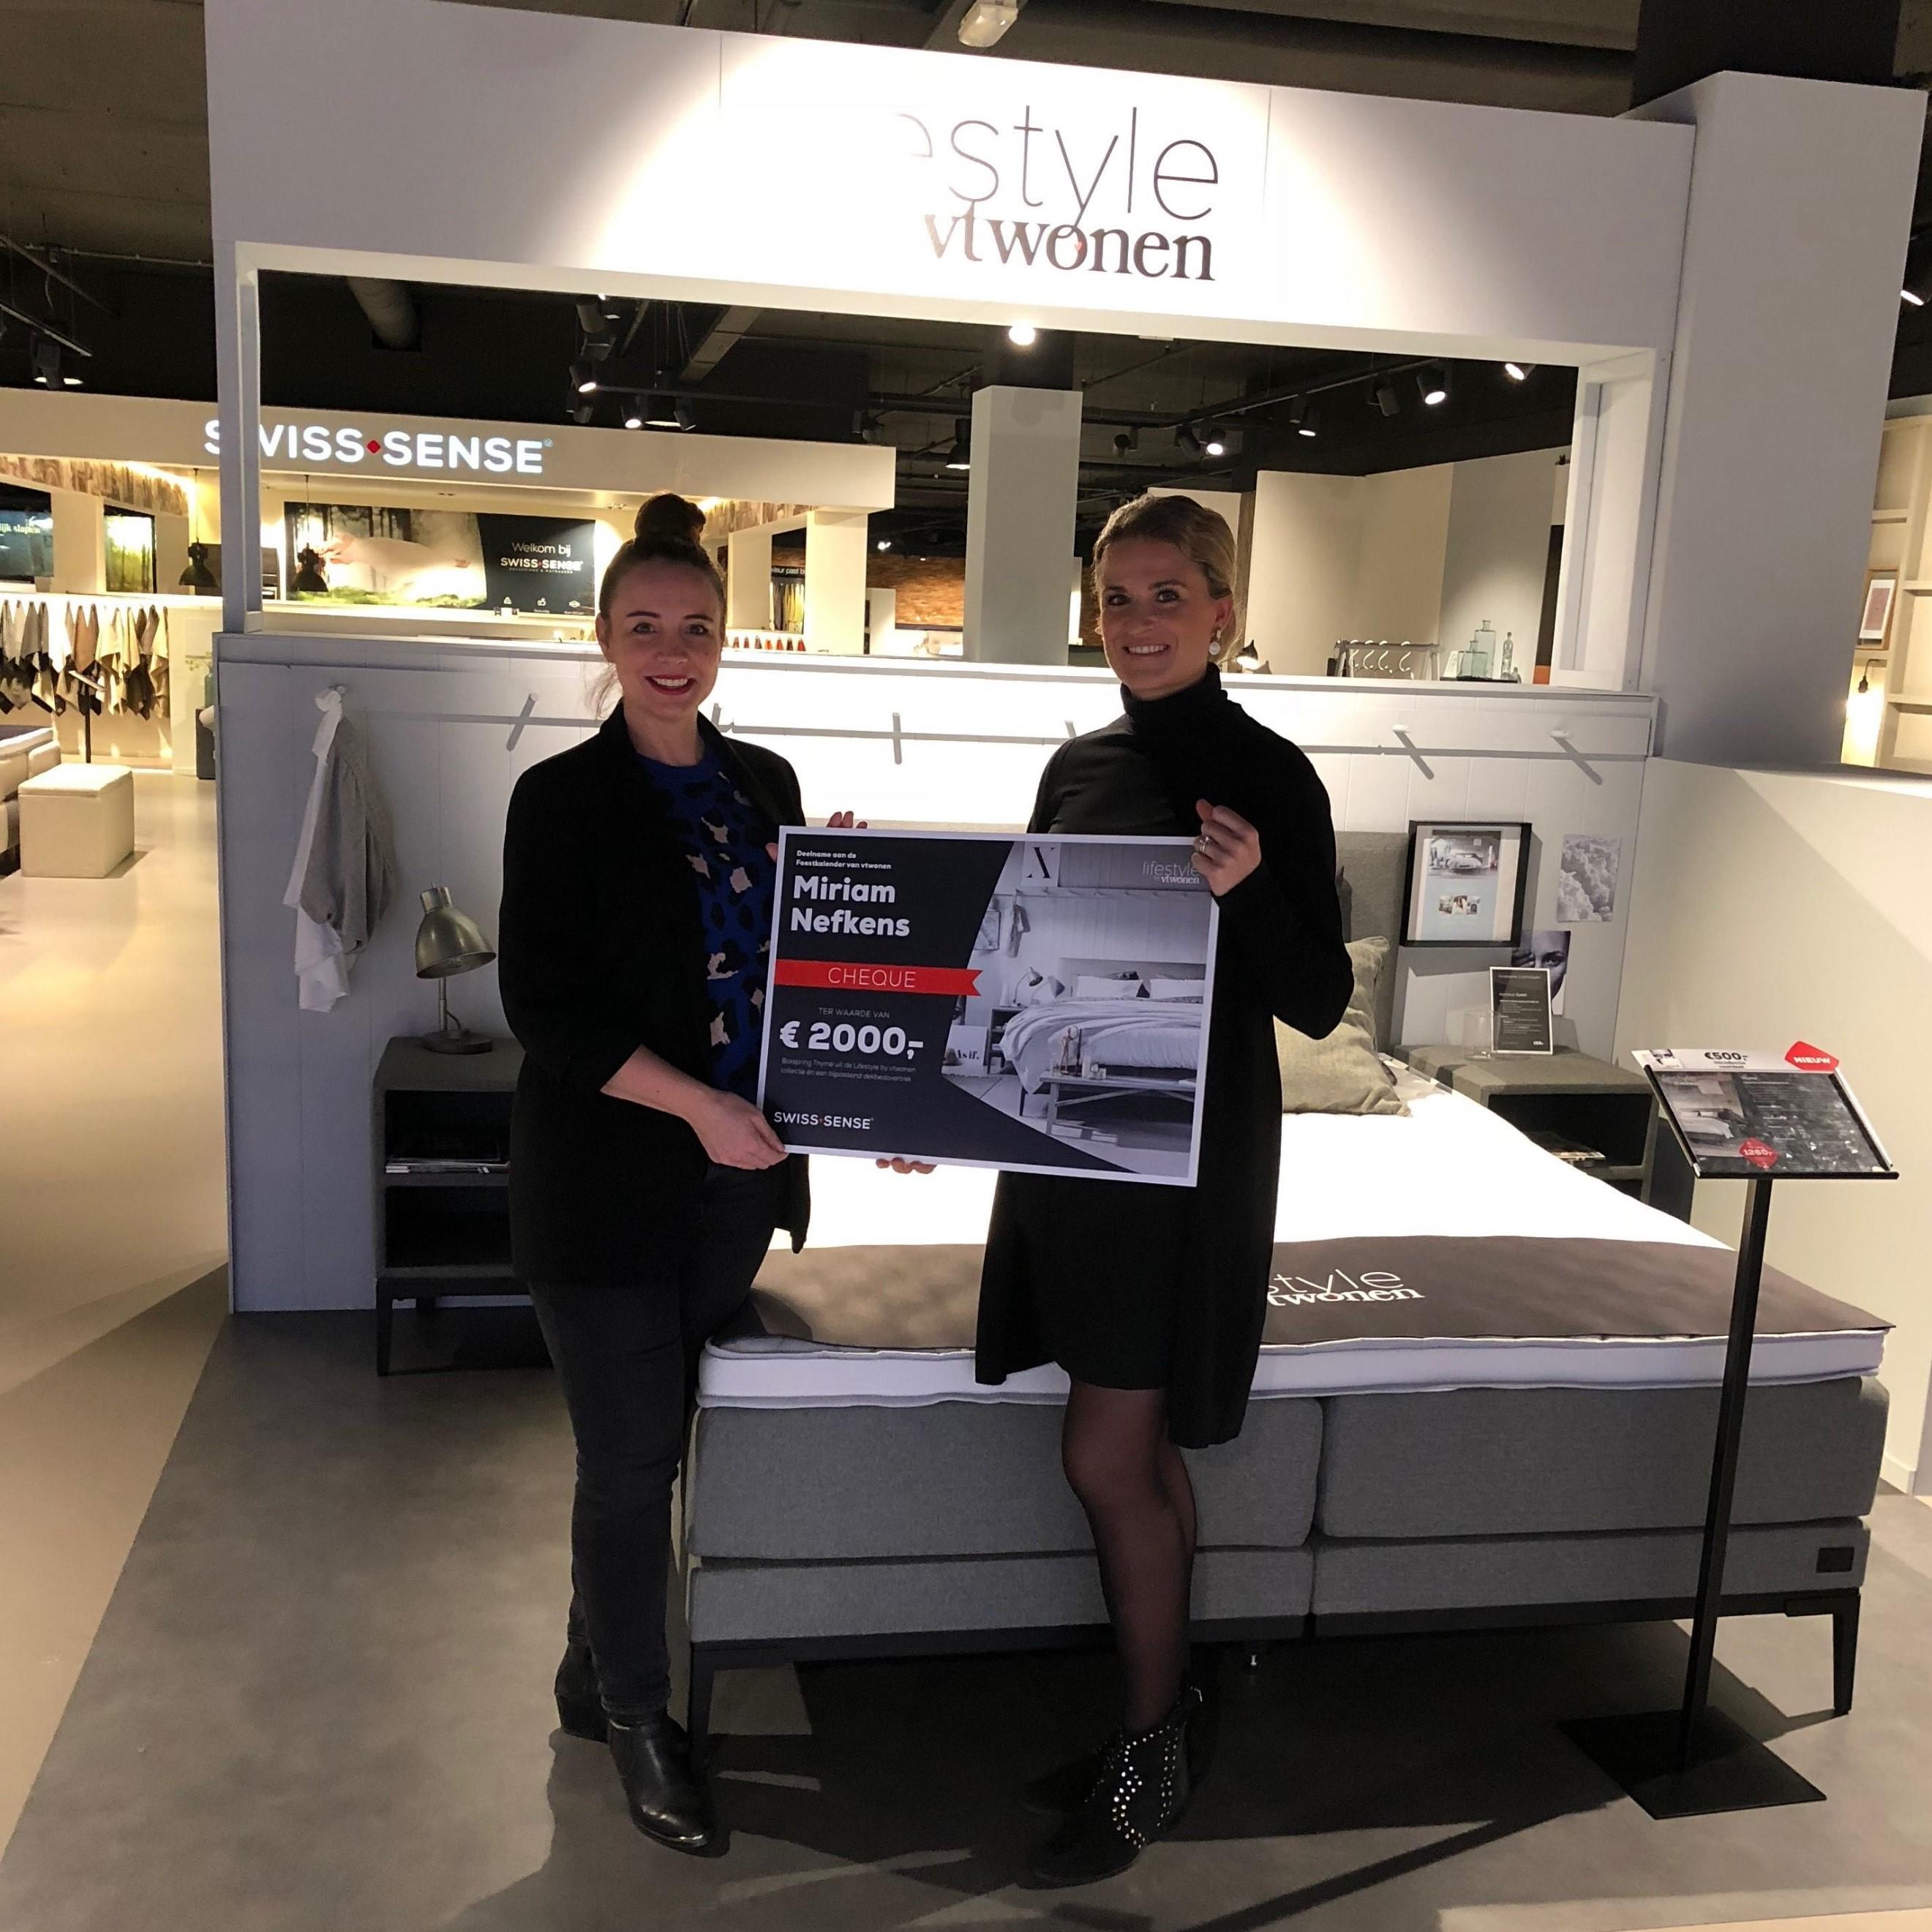 Miriam wint boxspring Thyme met vtwonen feestkalender | Swiss Sense